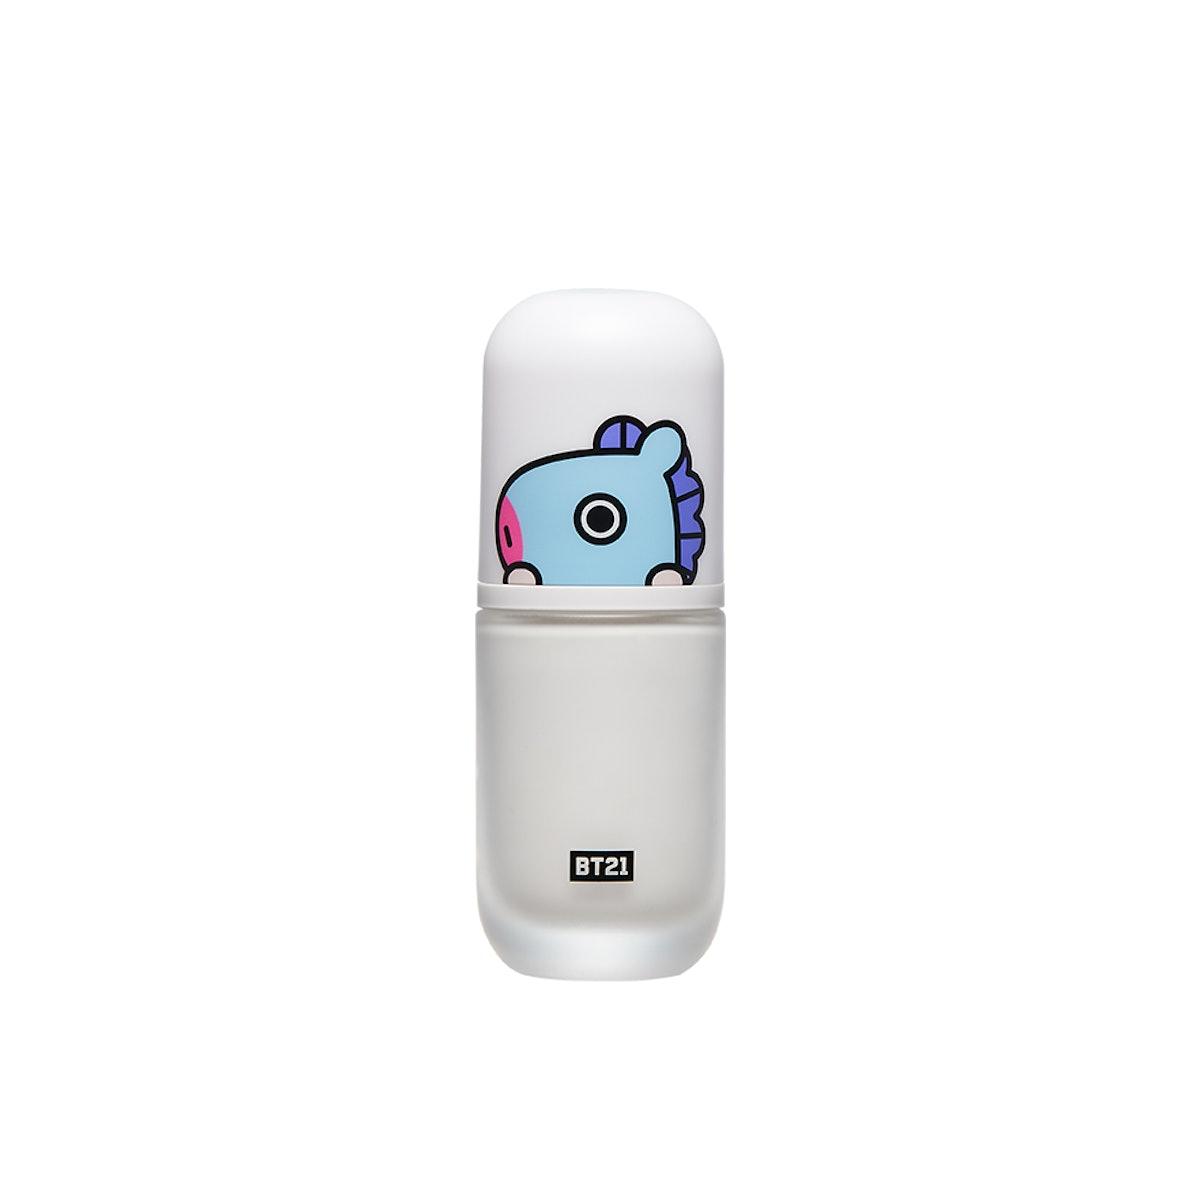 BT21 Tinted Milk Cream